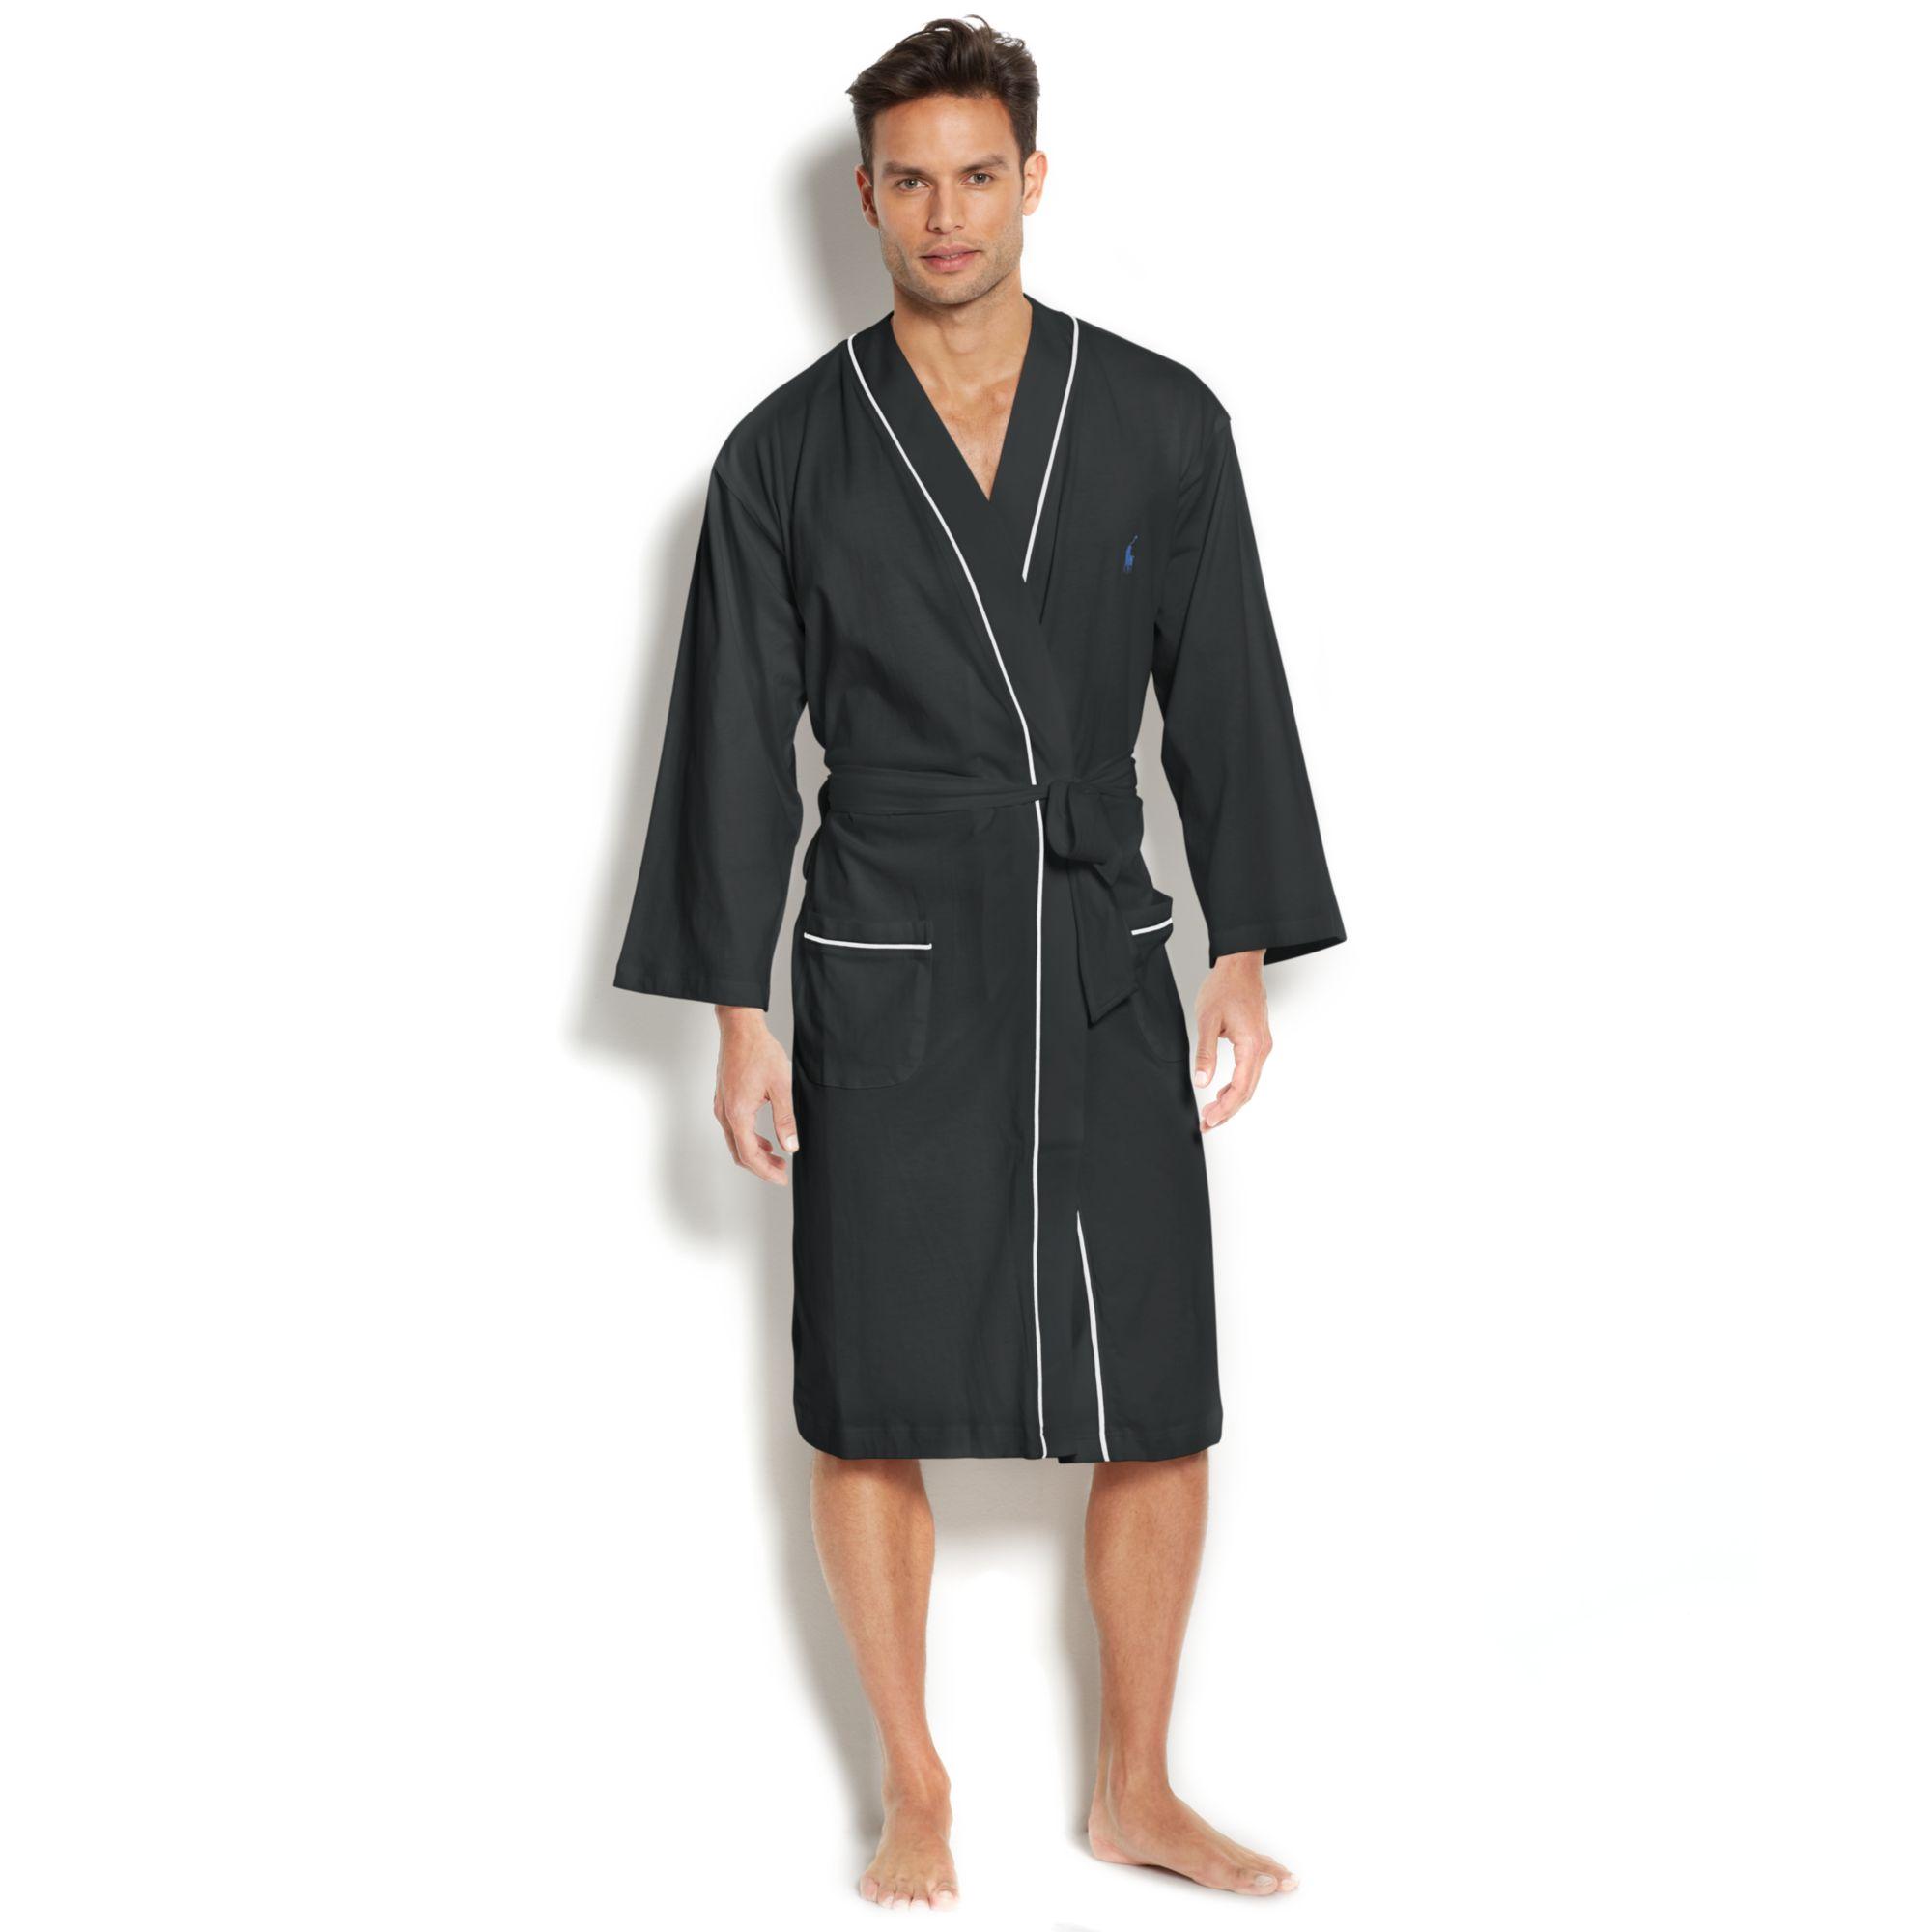 Lyst - Ralph Lauren Polo Mens Jersey Kimono Robe in Gray for Men a7cde049e99